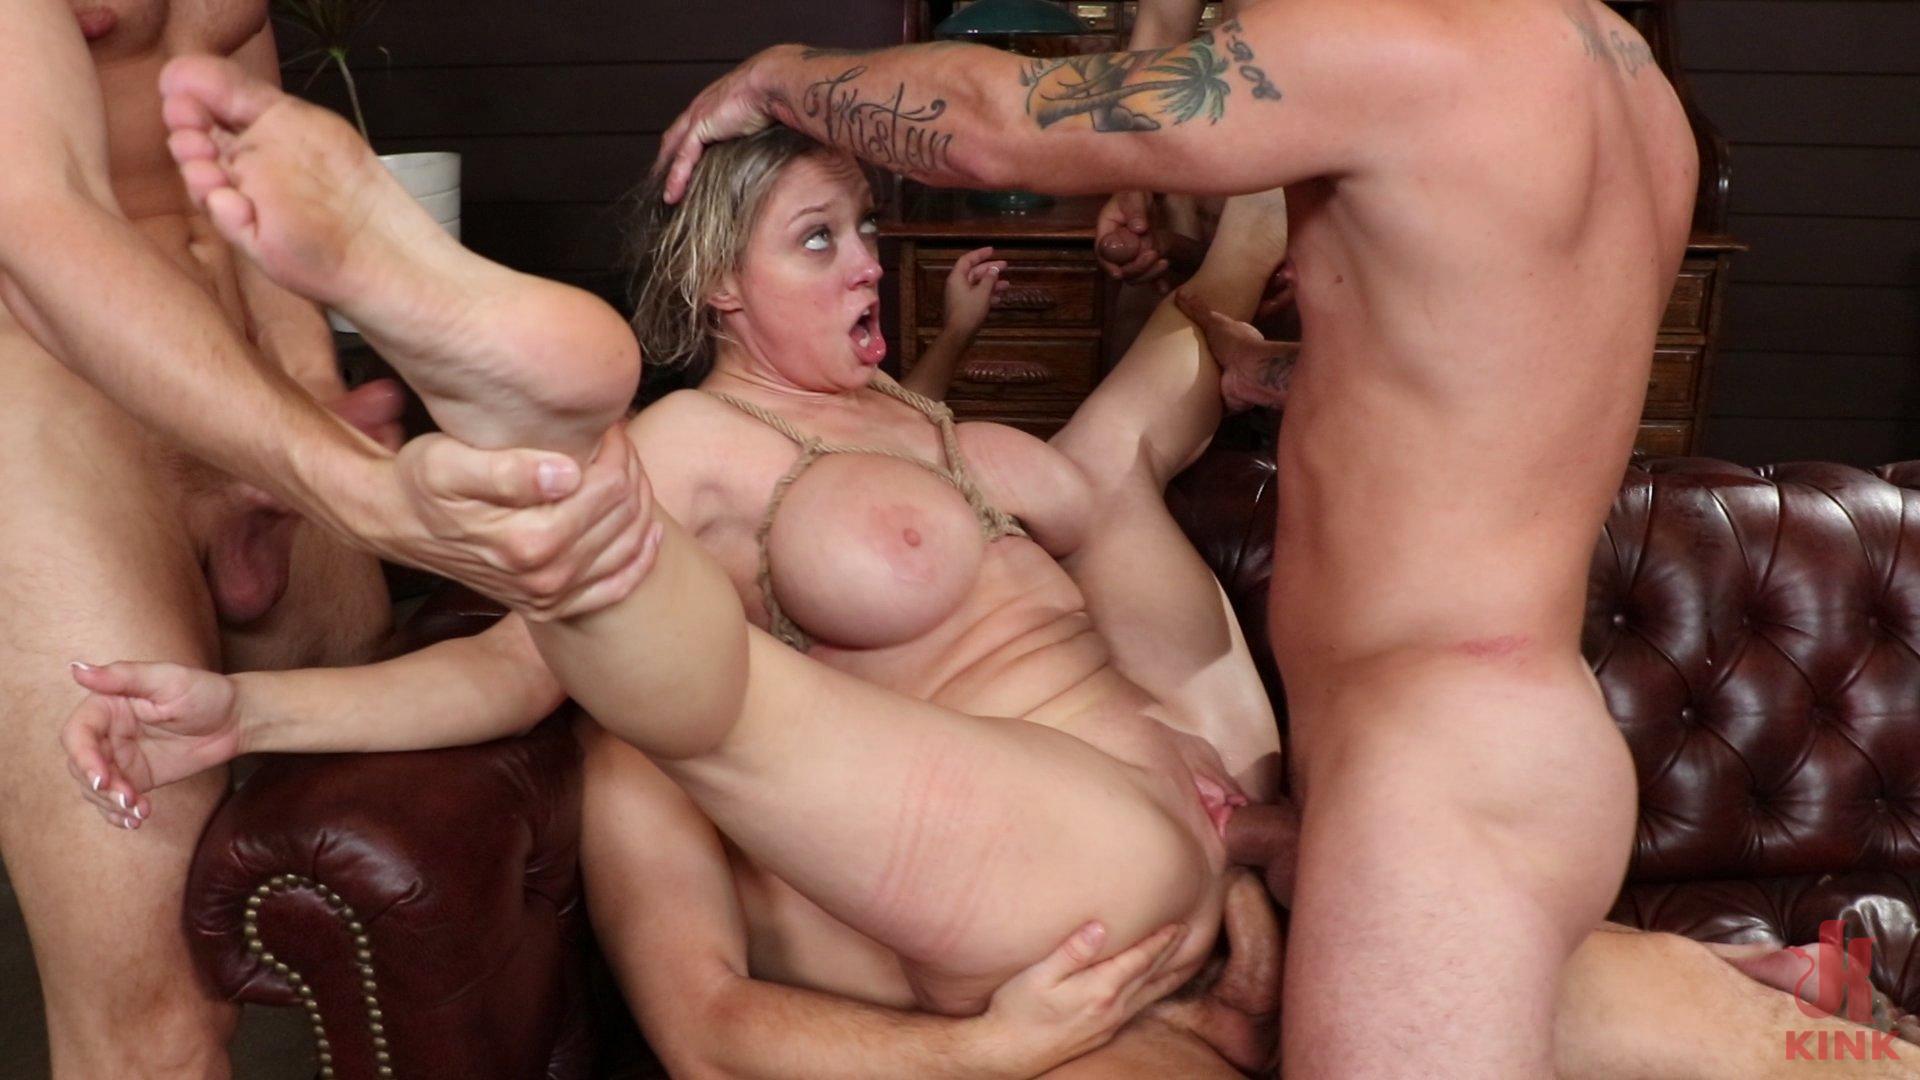 BoundGangBangs.com - Dee Williams Gets Schooled: Big Tit Teacher Gets Stuffed Air Tight - Kink